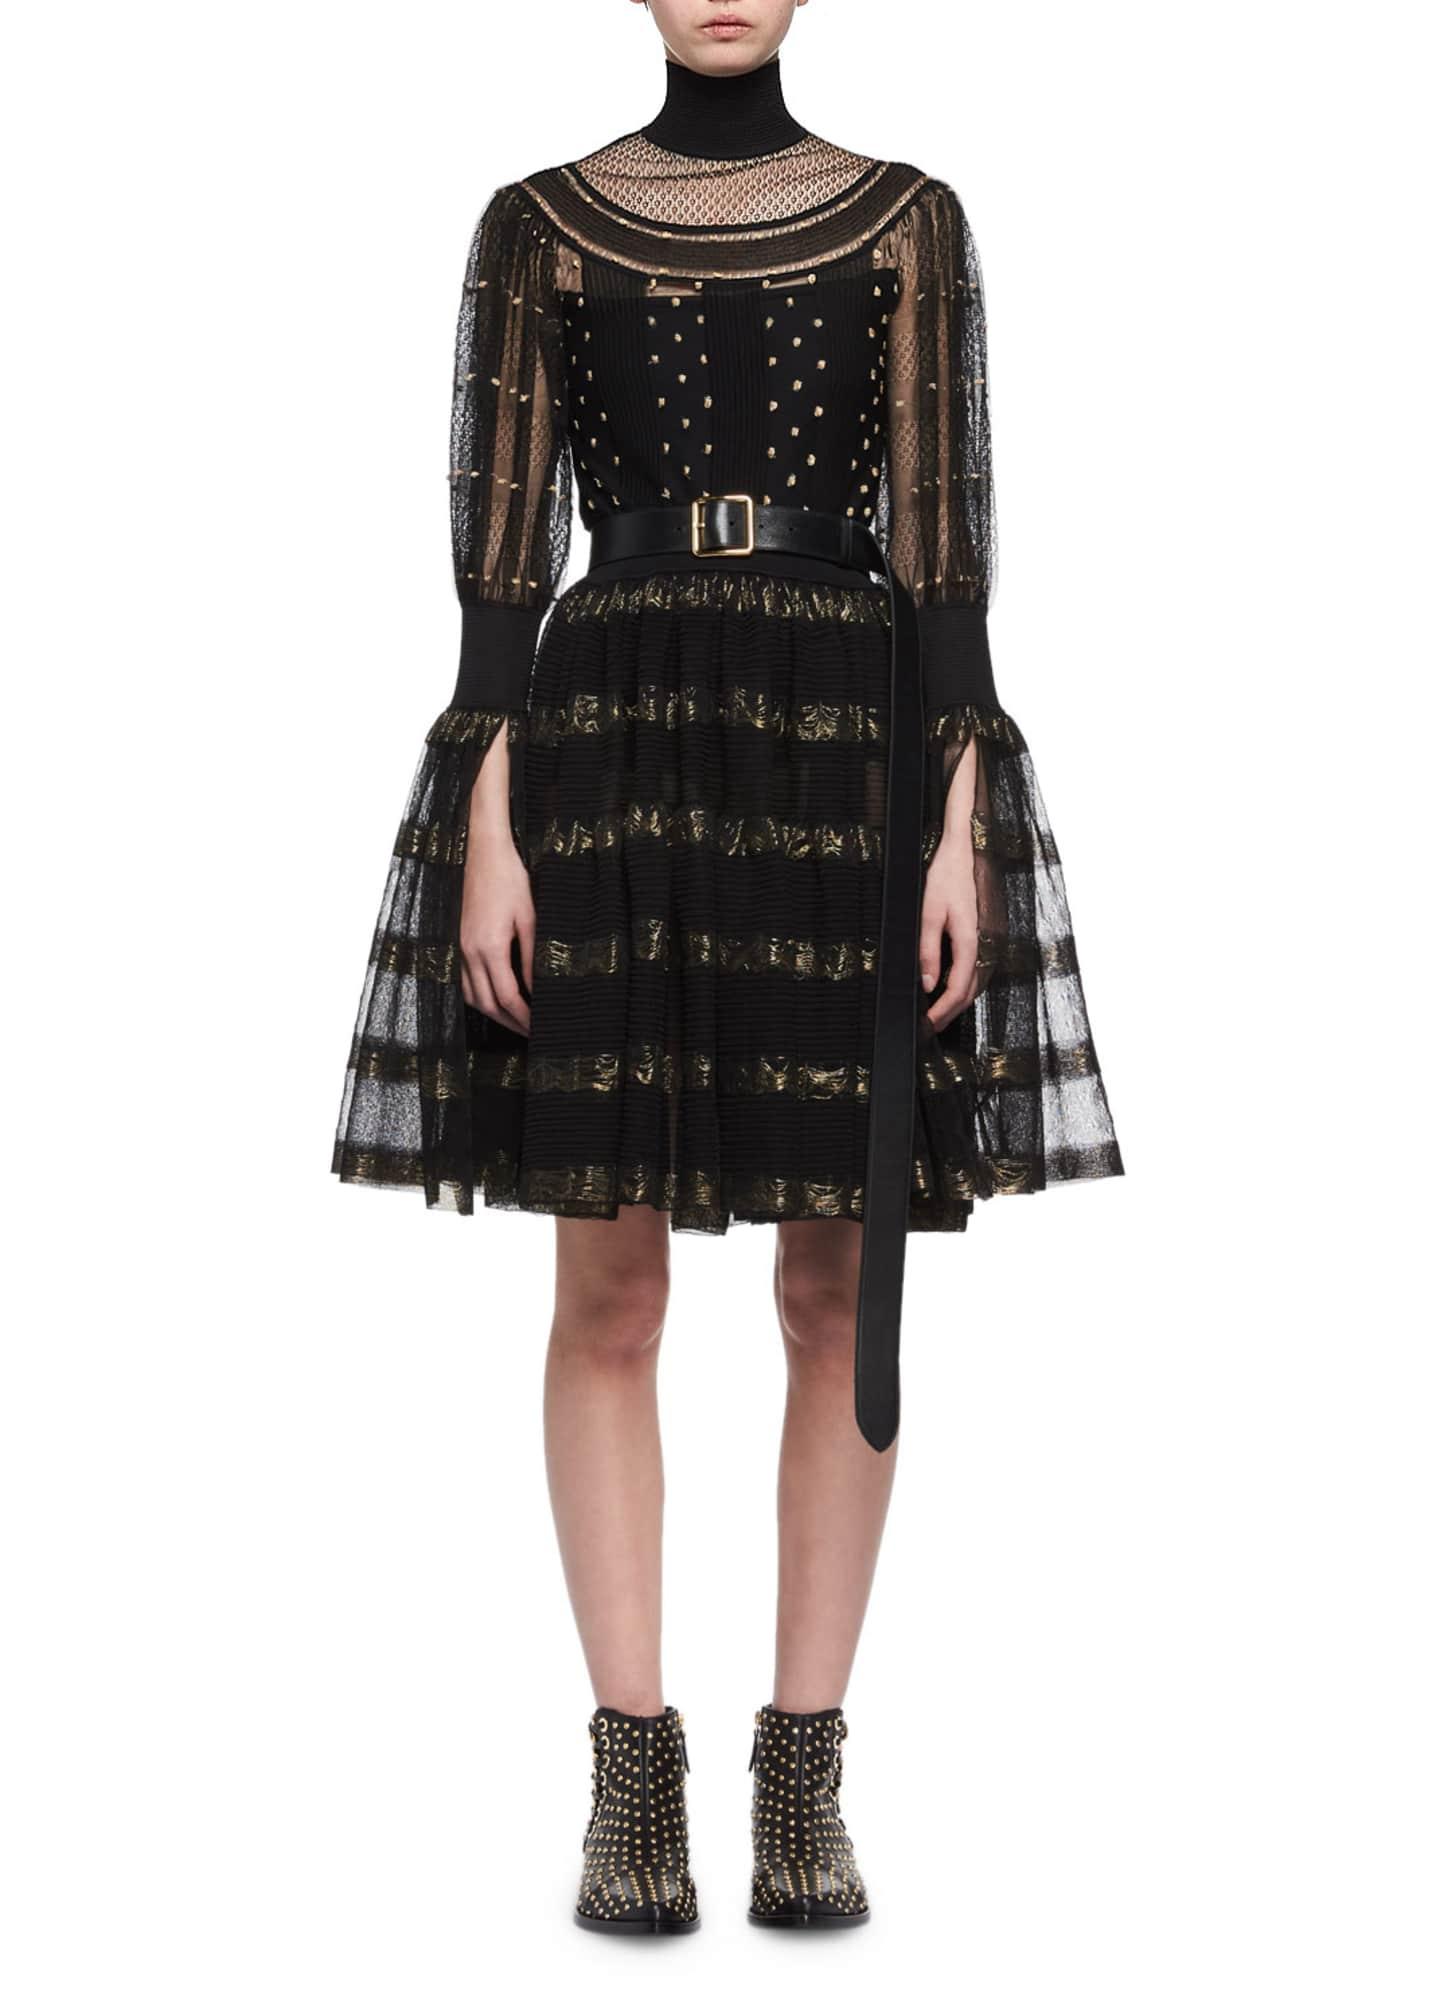 Alexander McQueen Metallic-Striped Lace Cocktail Dress, Black/Gold